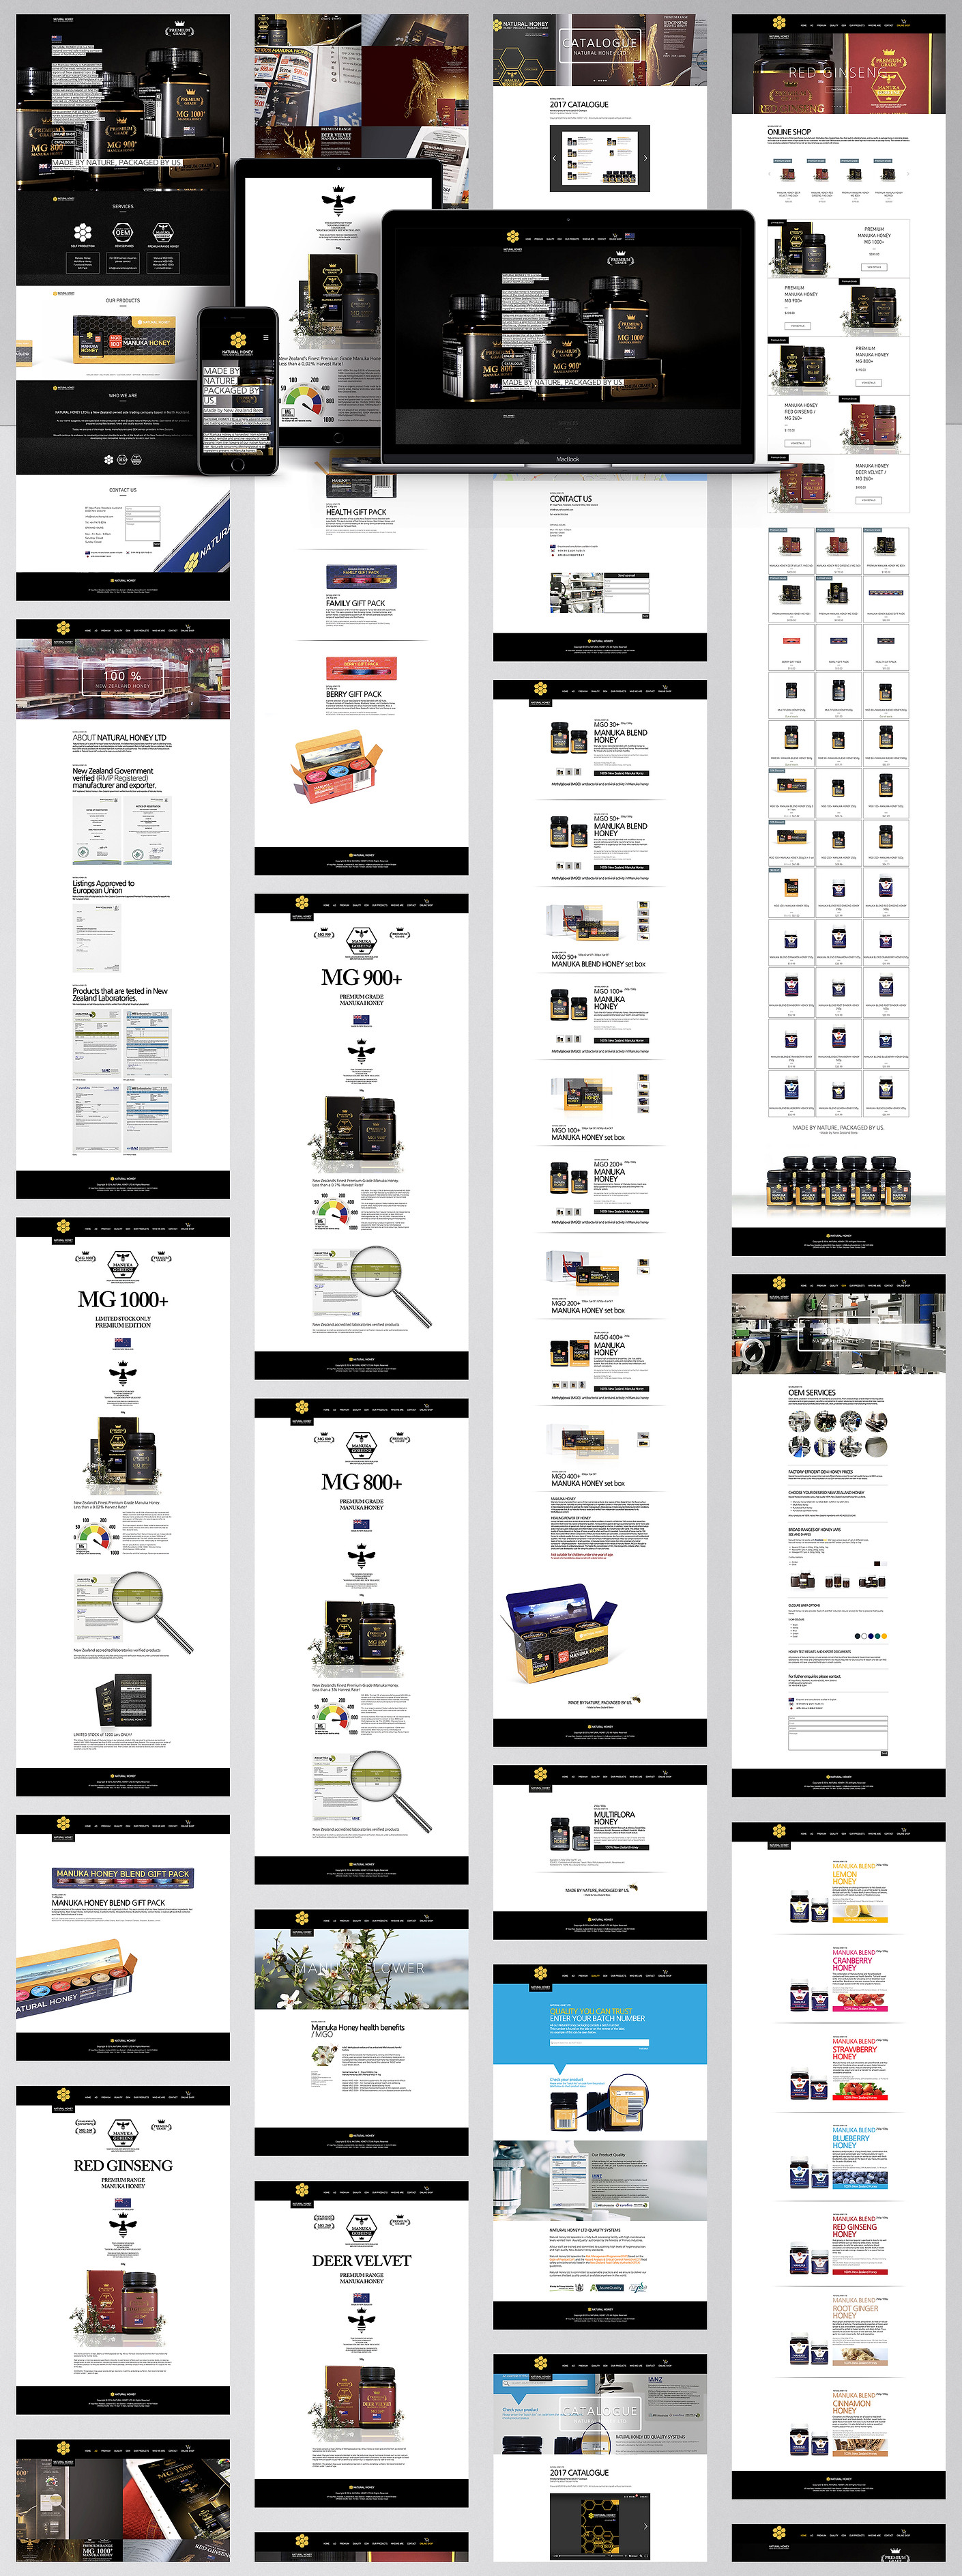 Natural Honey Ltd-Homepage Design